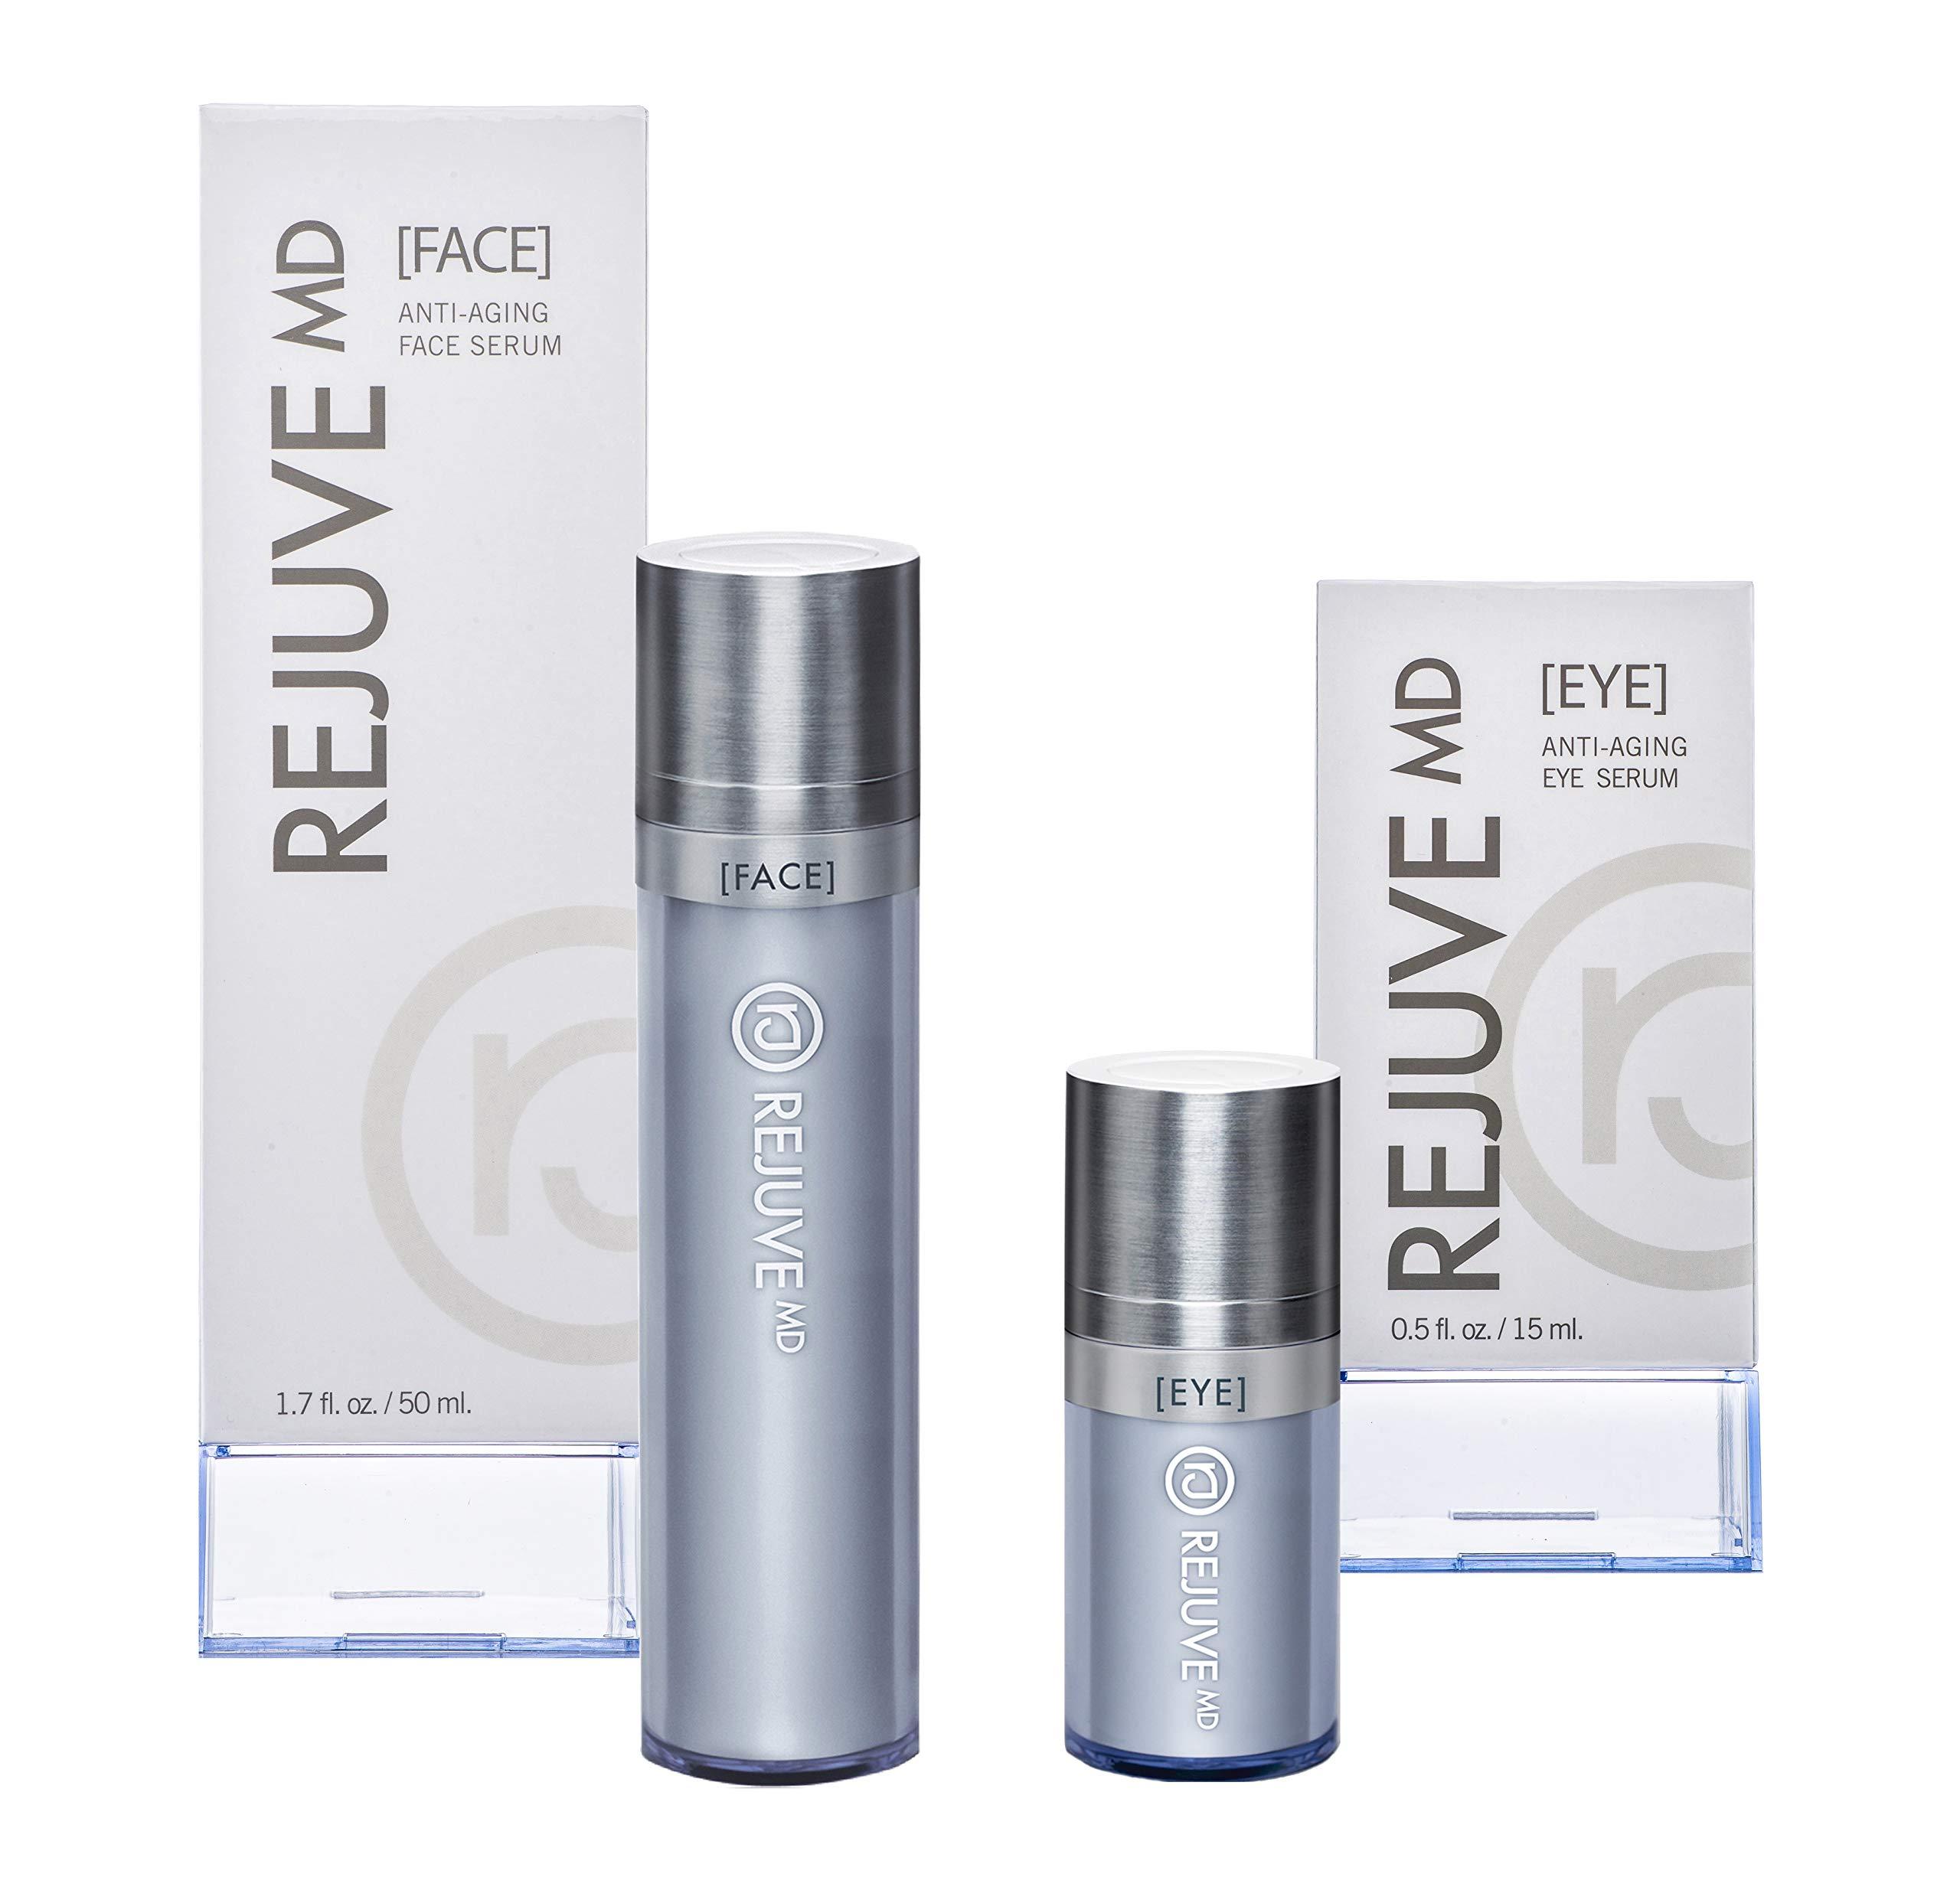 Rejuve MD Rejuvemd Anti-Aging Face & Eye Serum Set